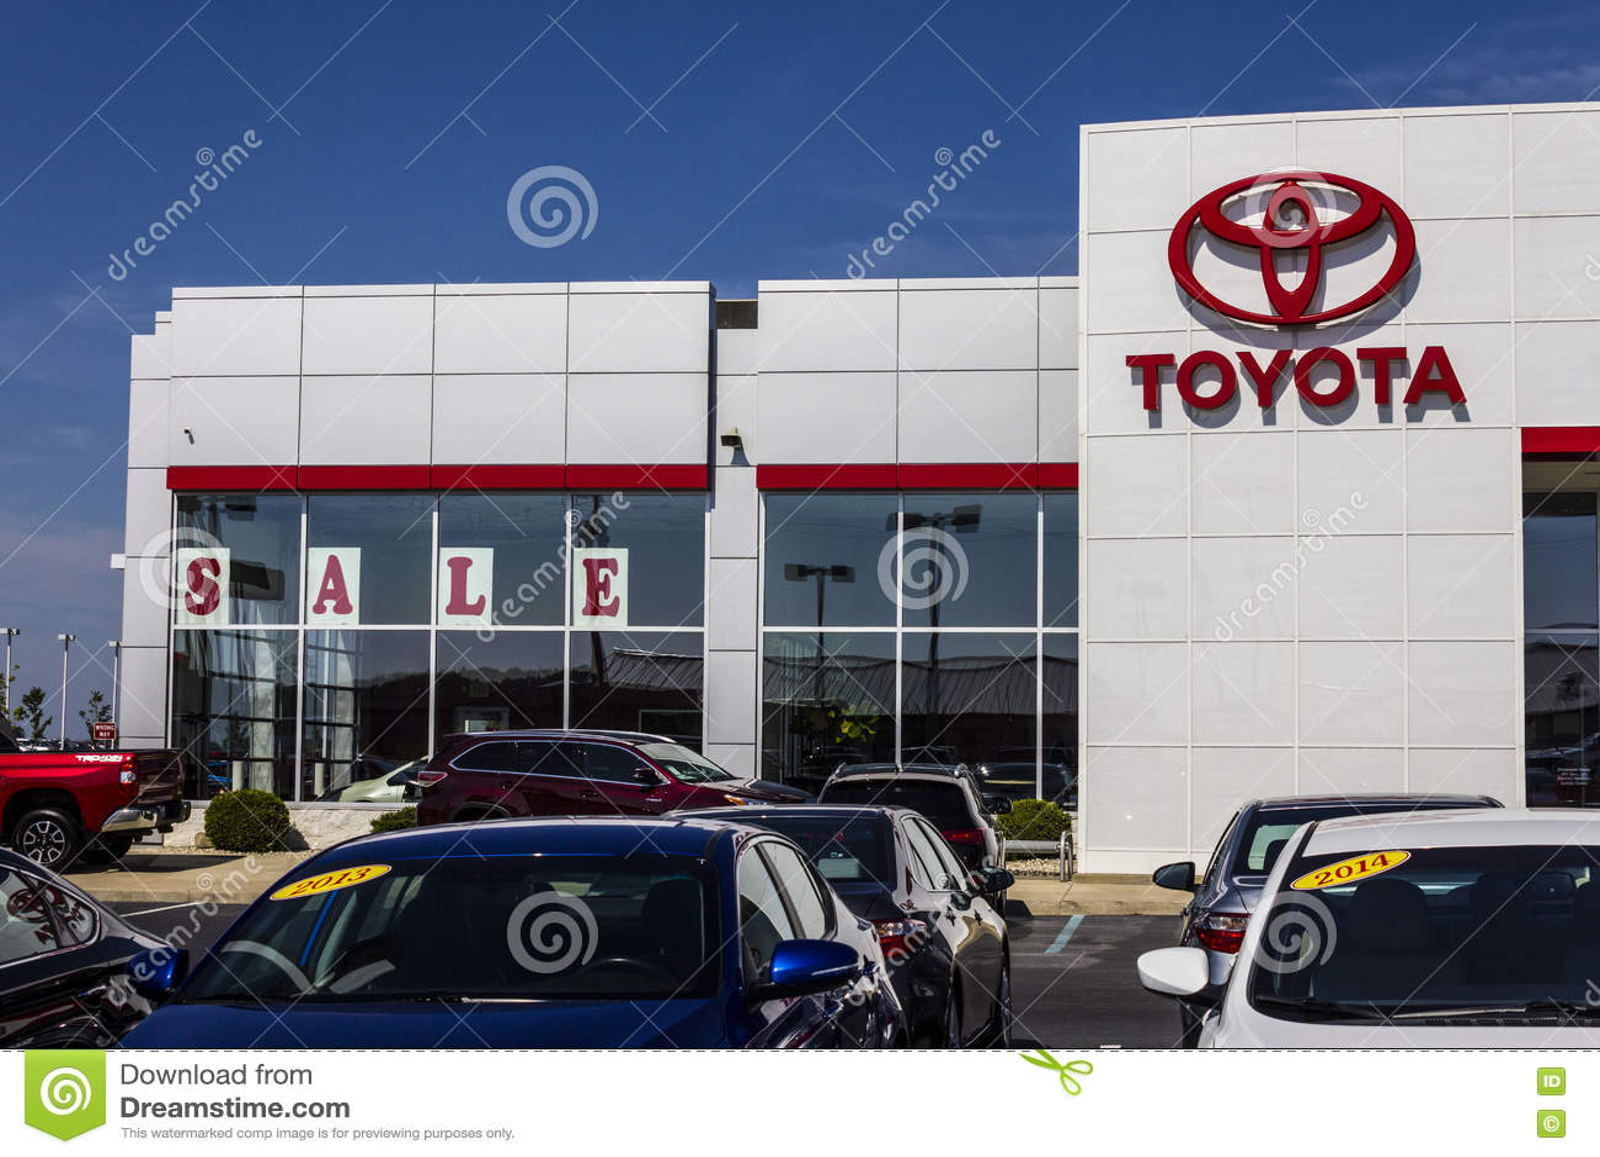 Muncie Car Dealers >> Muncie In Circa August 2016 A Local Toyota Car And Suv